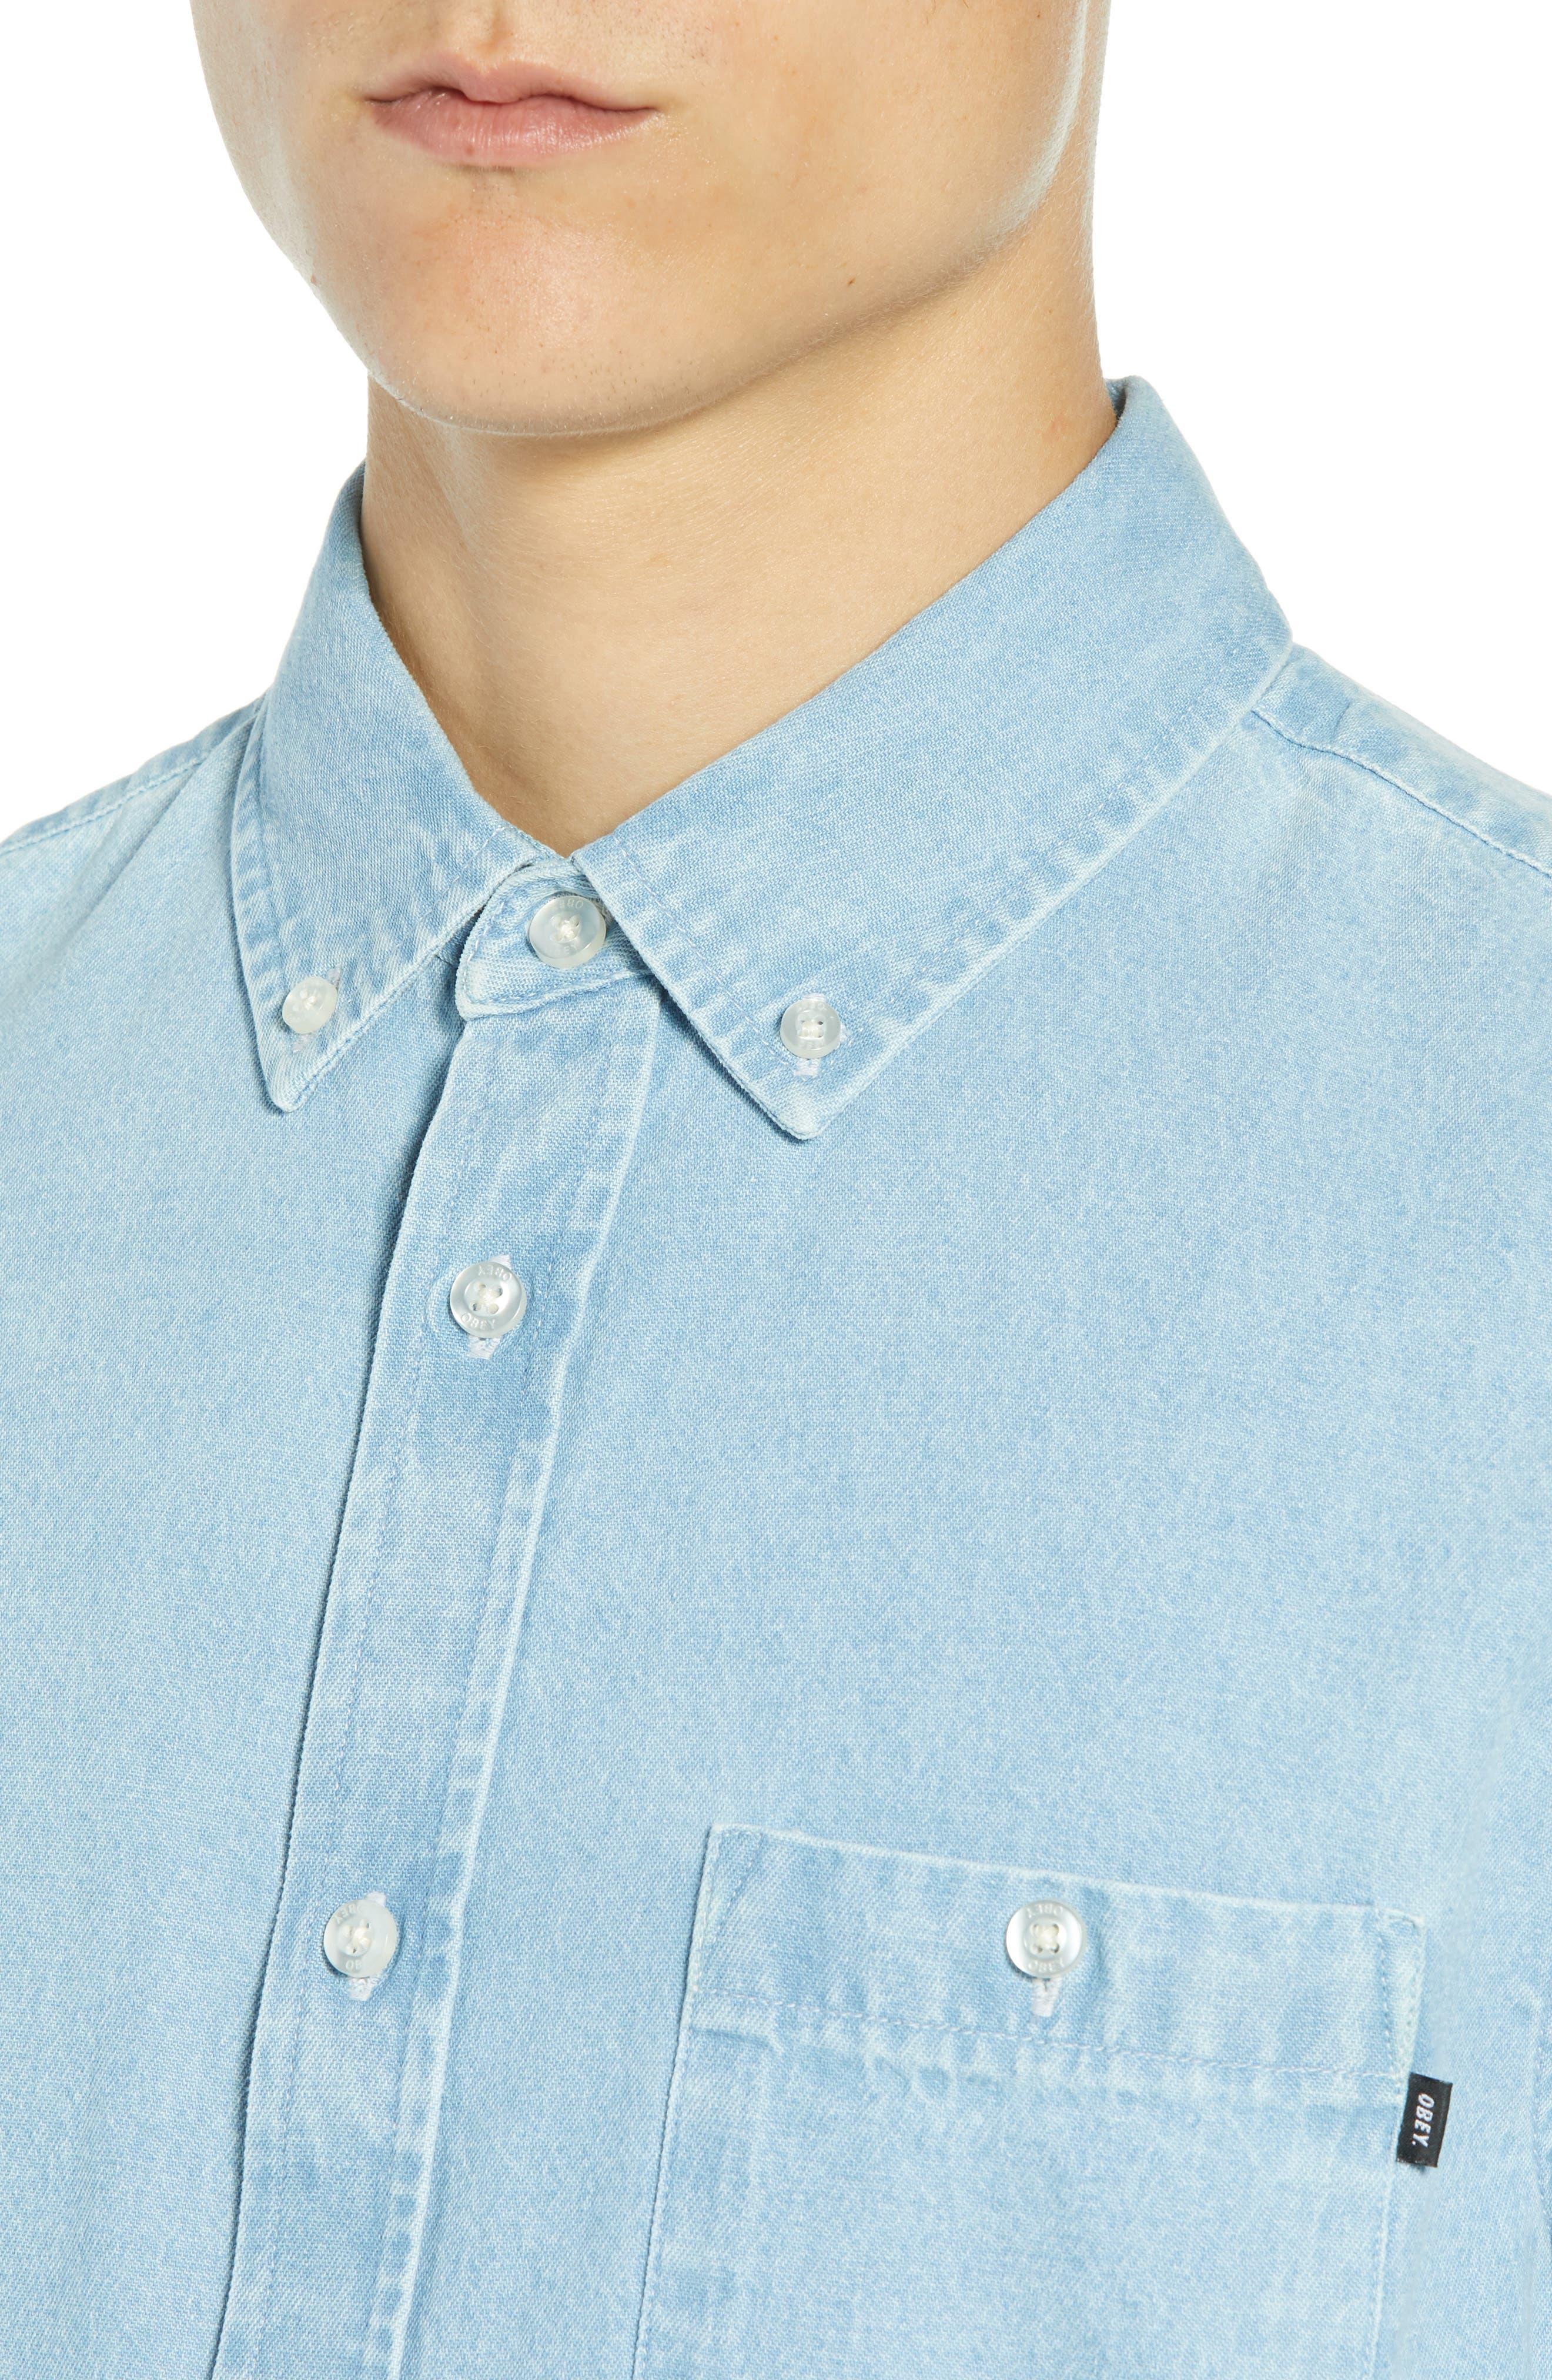 Keble Chambray Shirt,                             Alternate thumbnail 2, color,                             BLUE